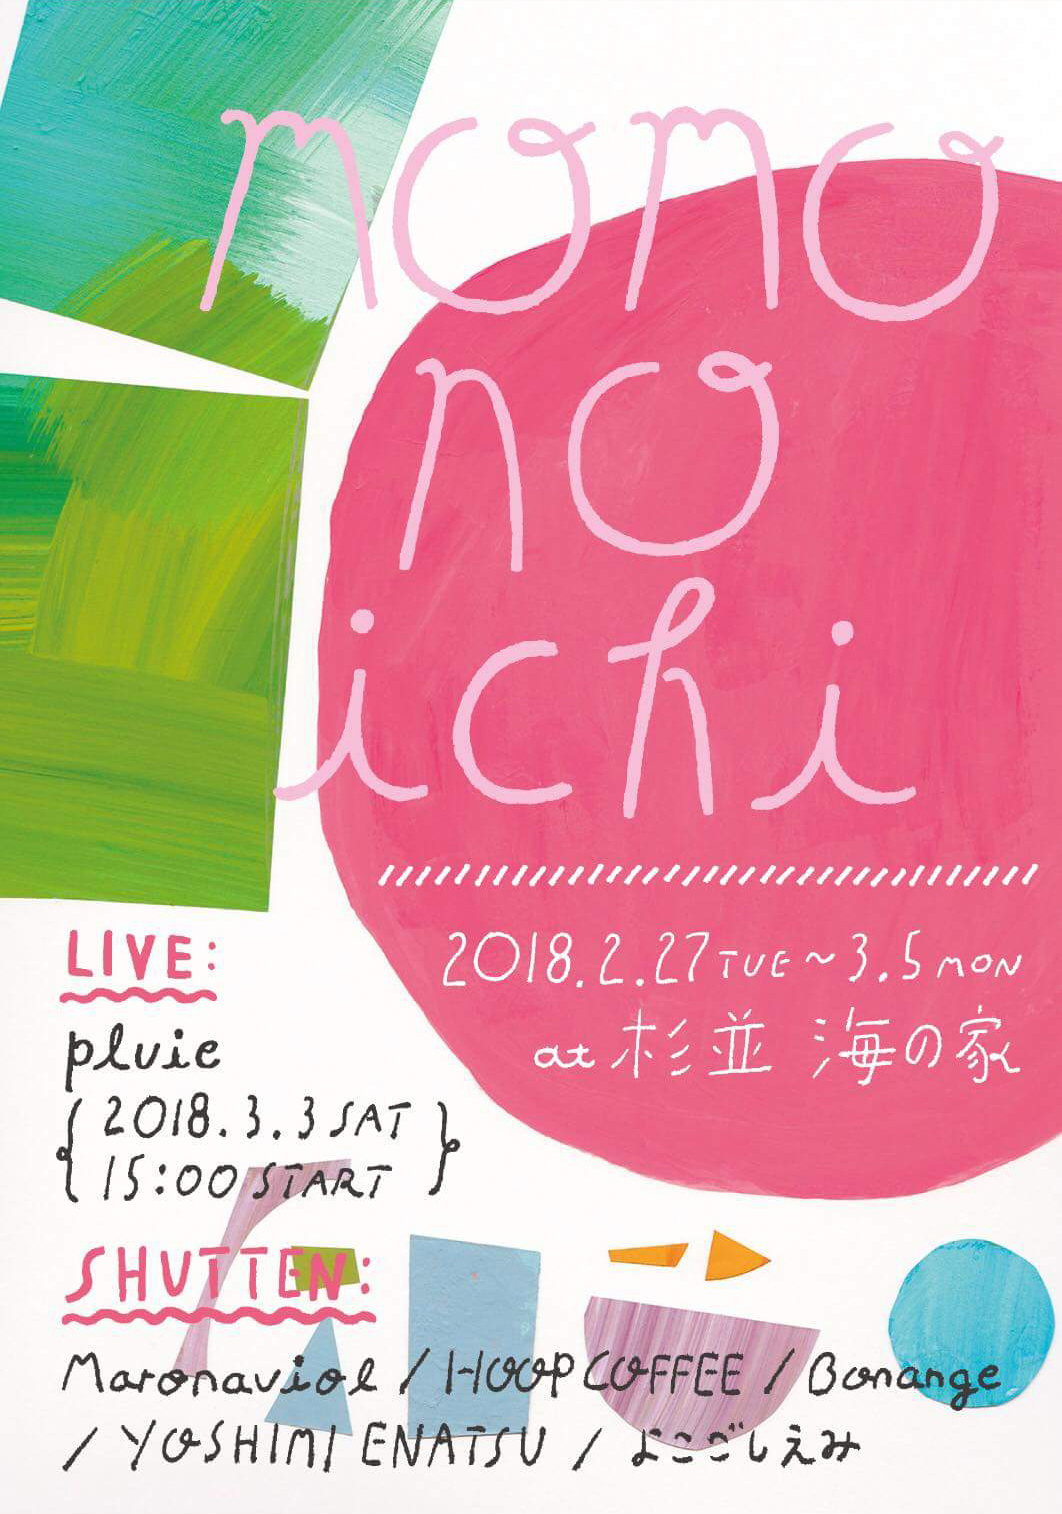 momonoichi (exhibition)